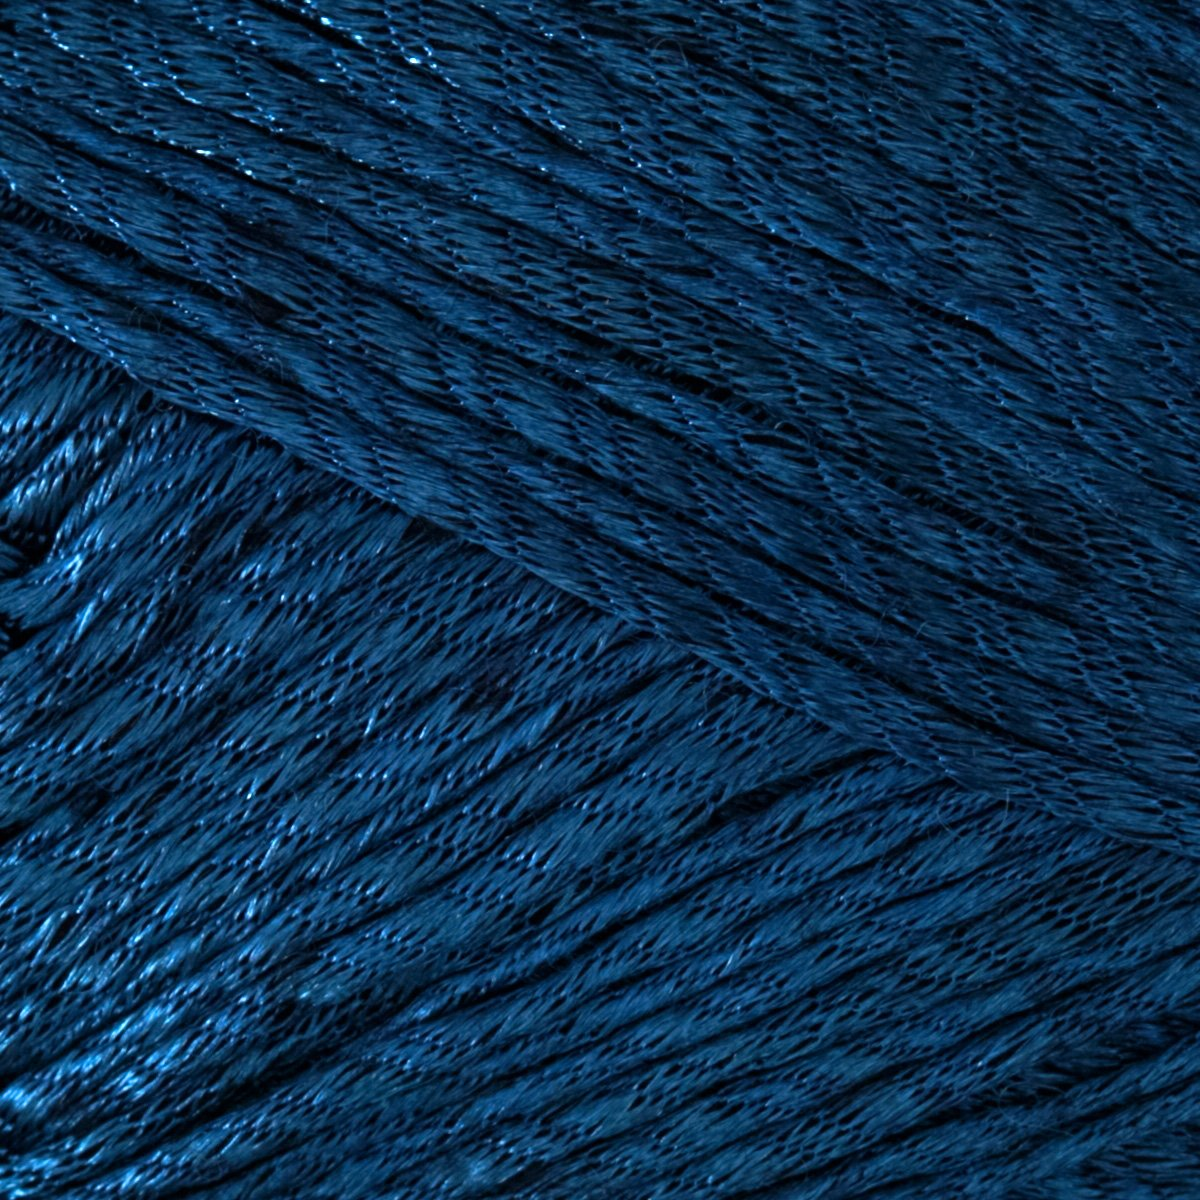 Amazon.com: Patons Metallic Yarn (95134) Blue Steel: Wall Art